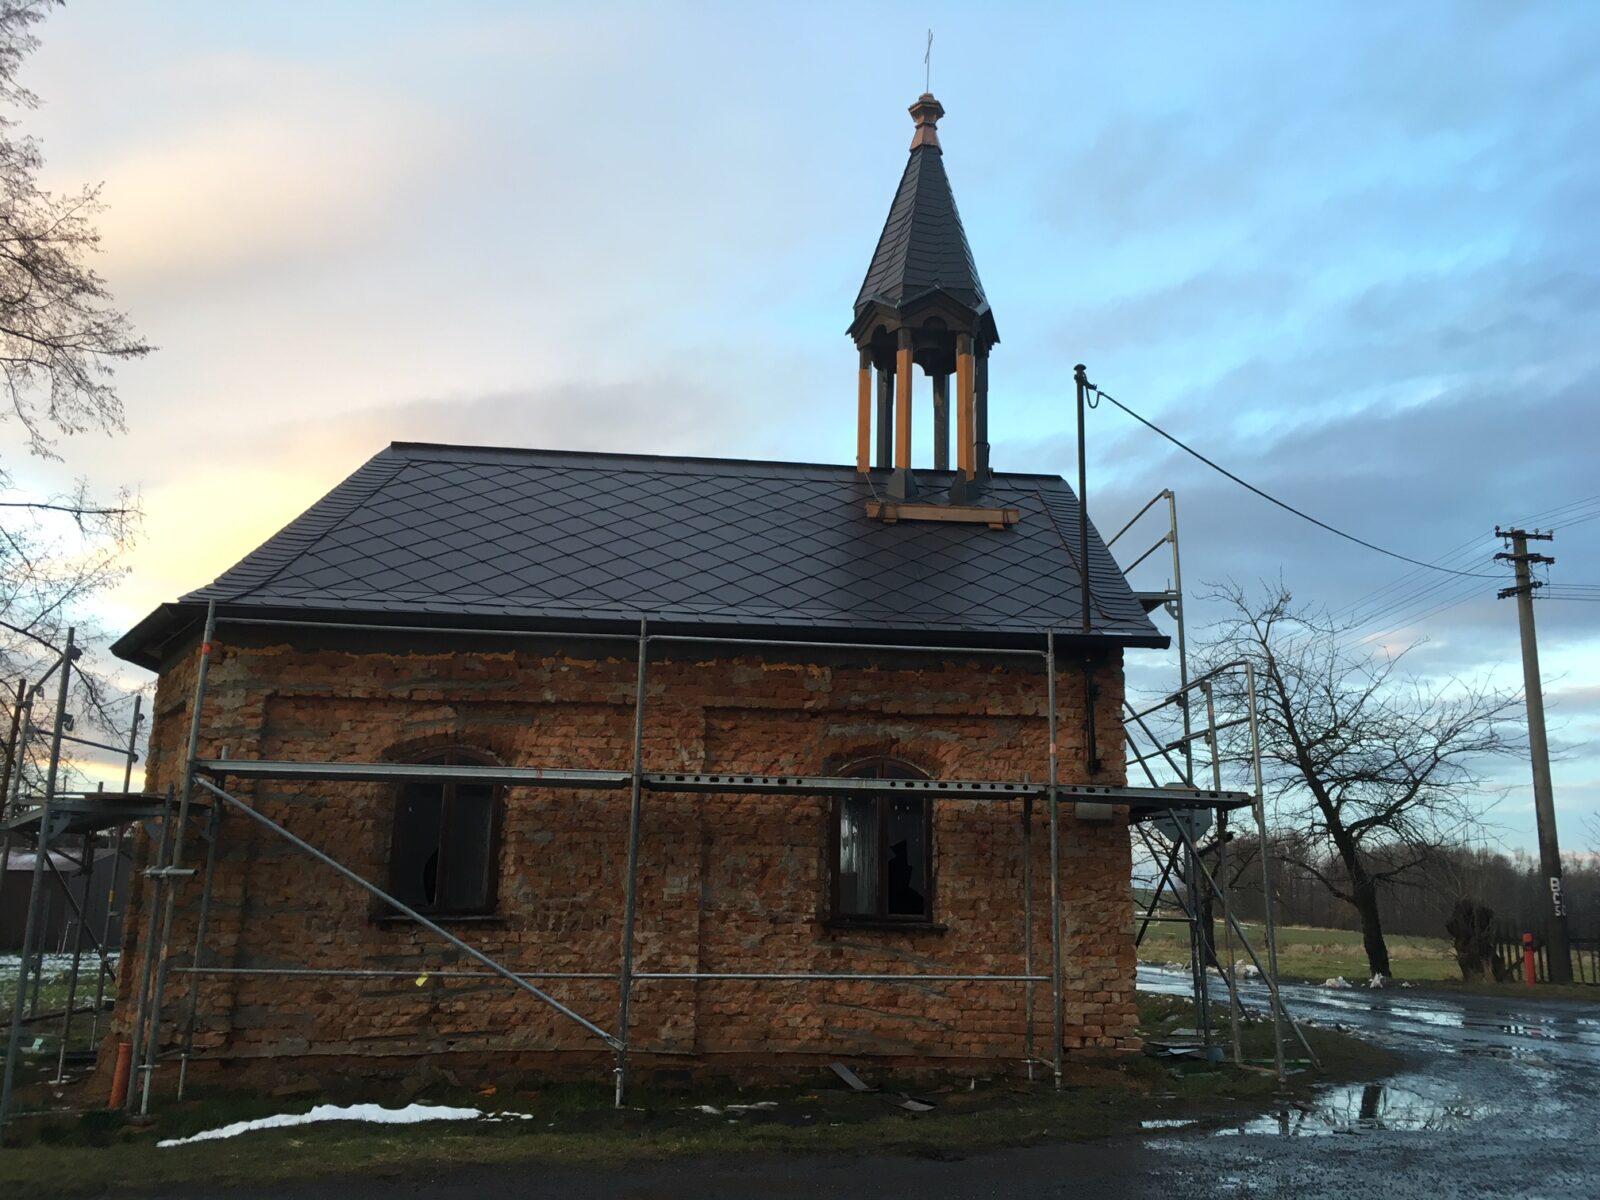 Kaple v renovaci, 12/2017